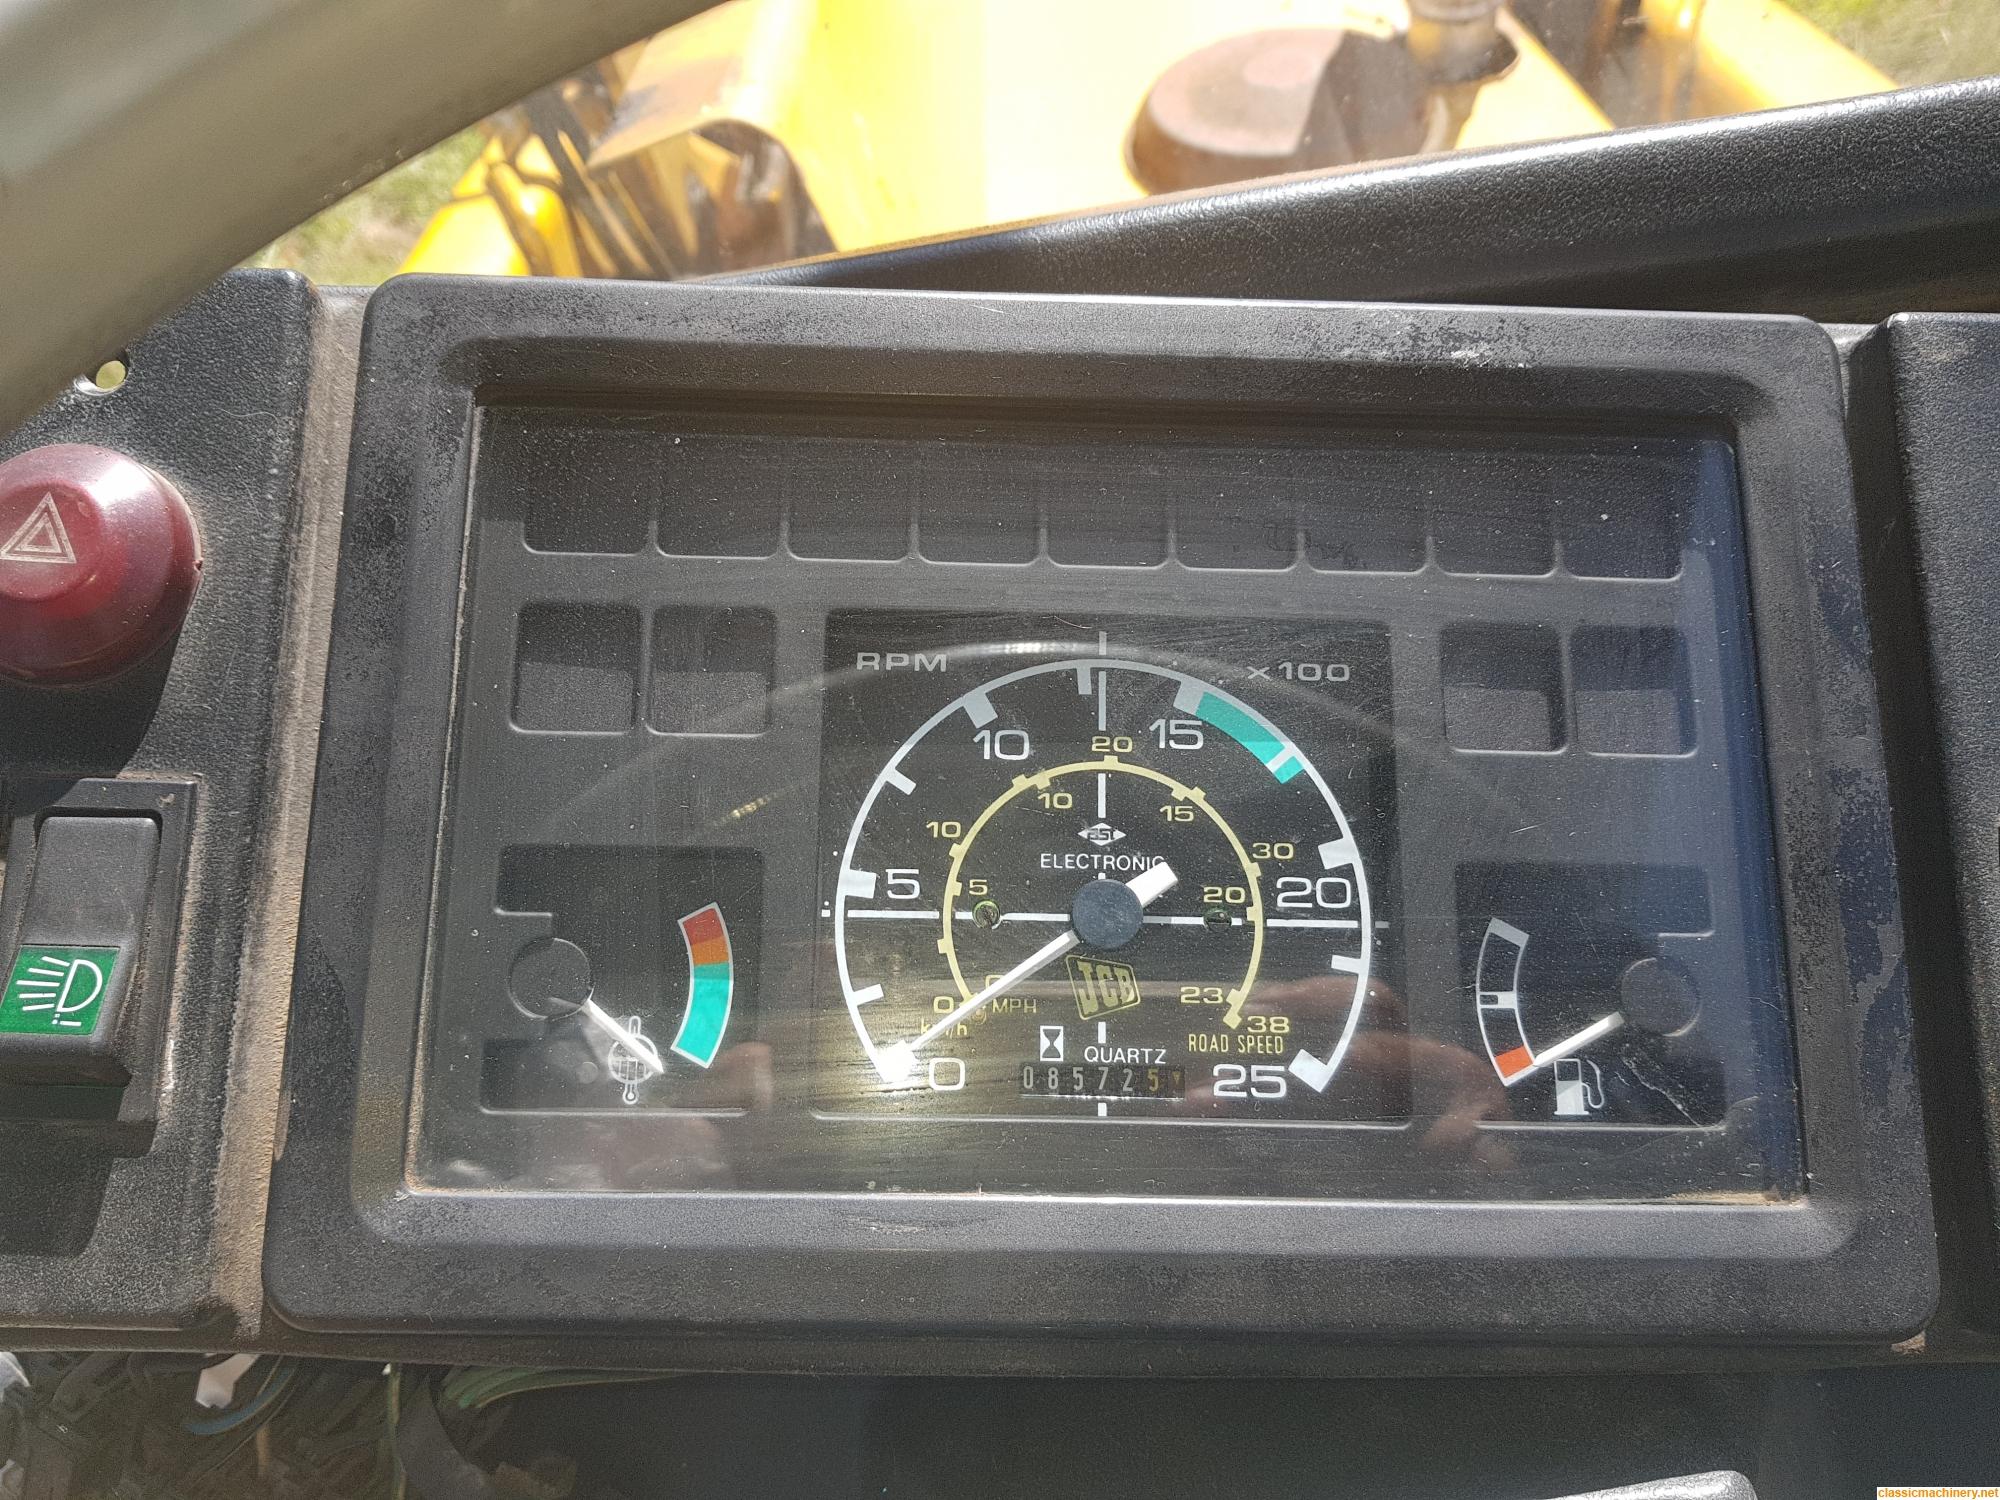 1990 JCB 3CX Tachometer  - The Classic Machinery Network